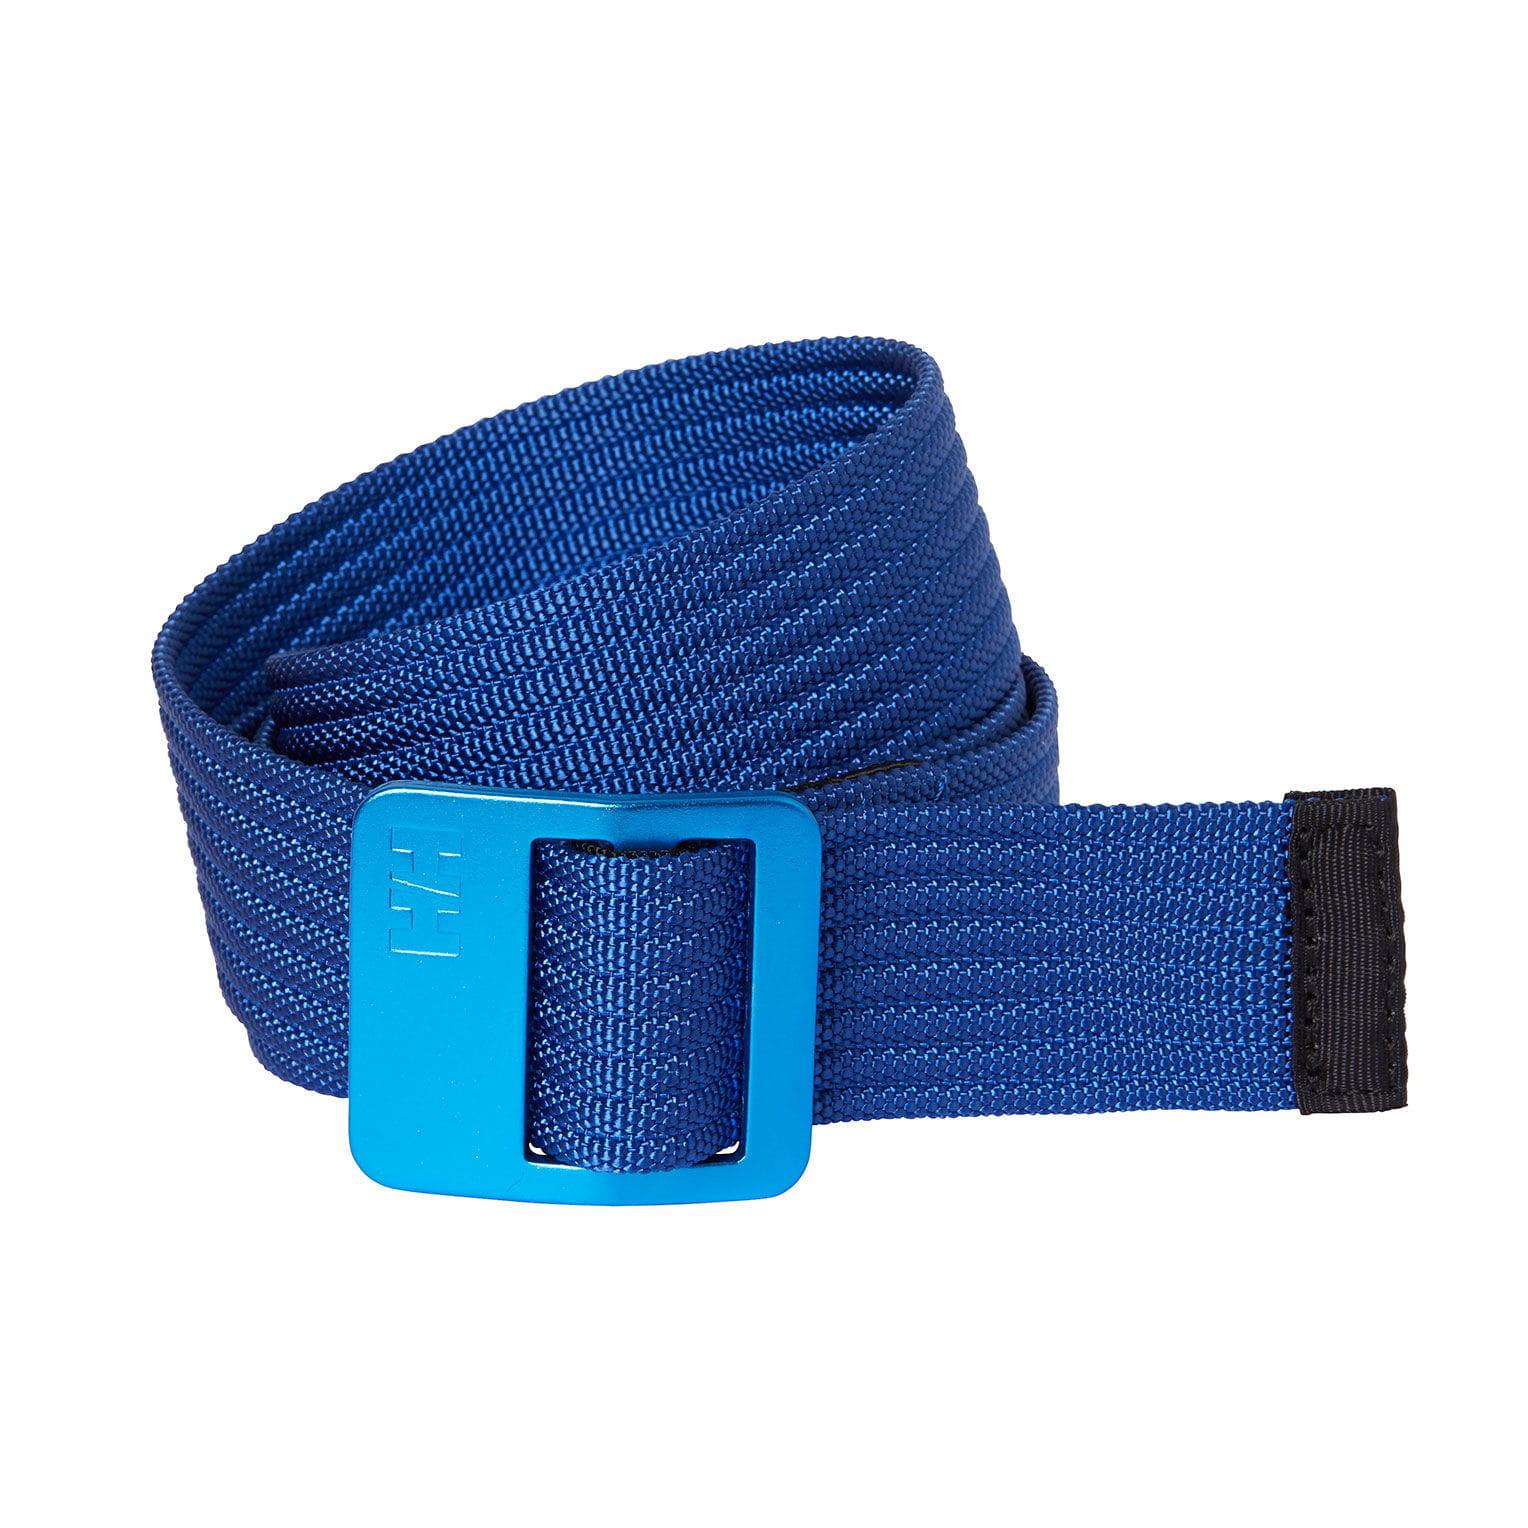 2a4995746fa464 Helly Hansen Pasek (67363) WEBBING niebieski 130cm Sklep żeglarski i ...